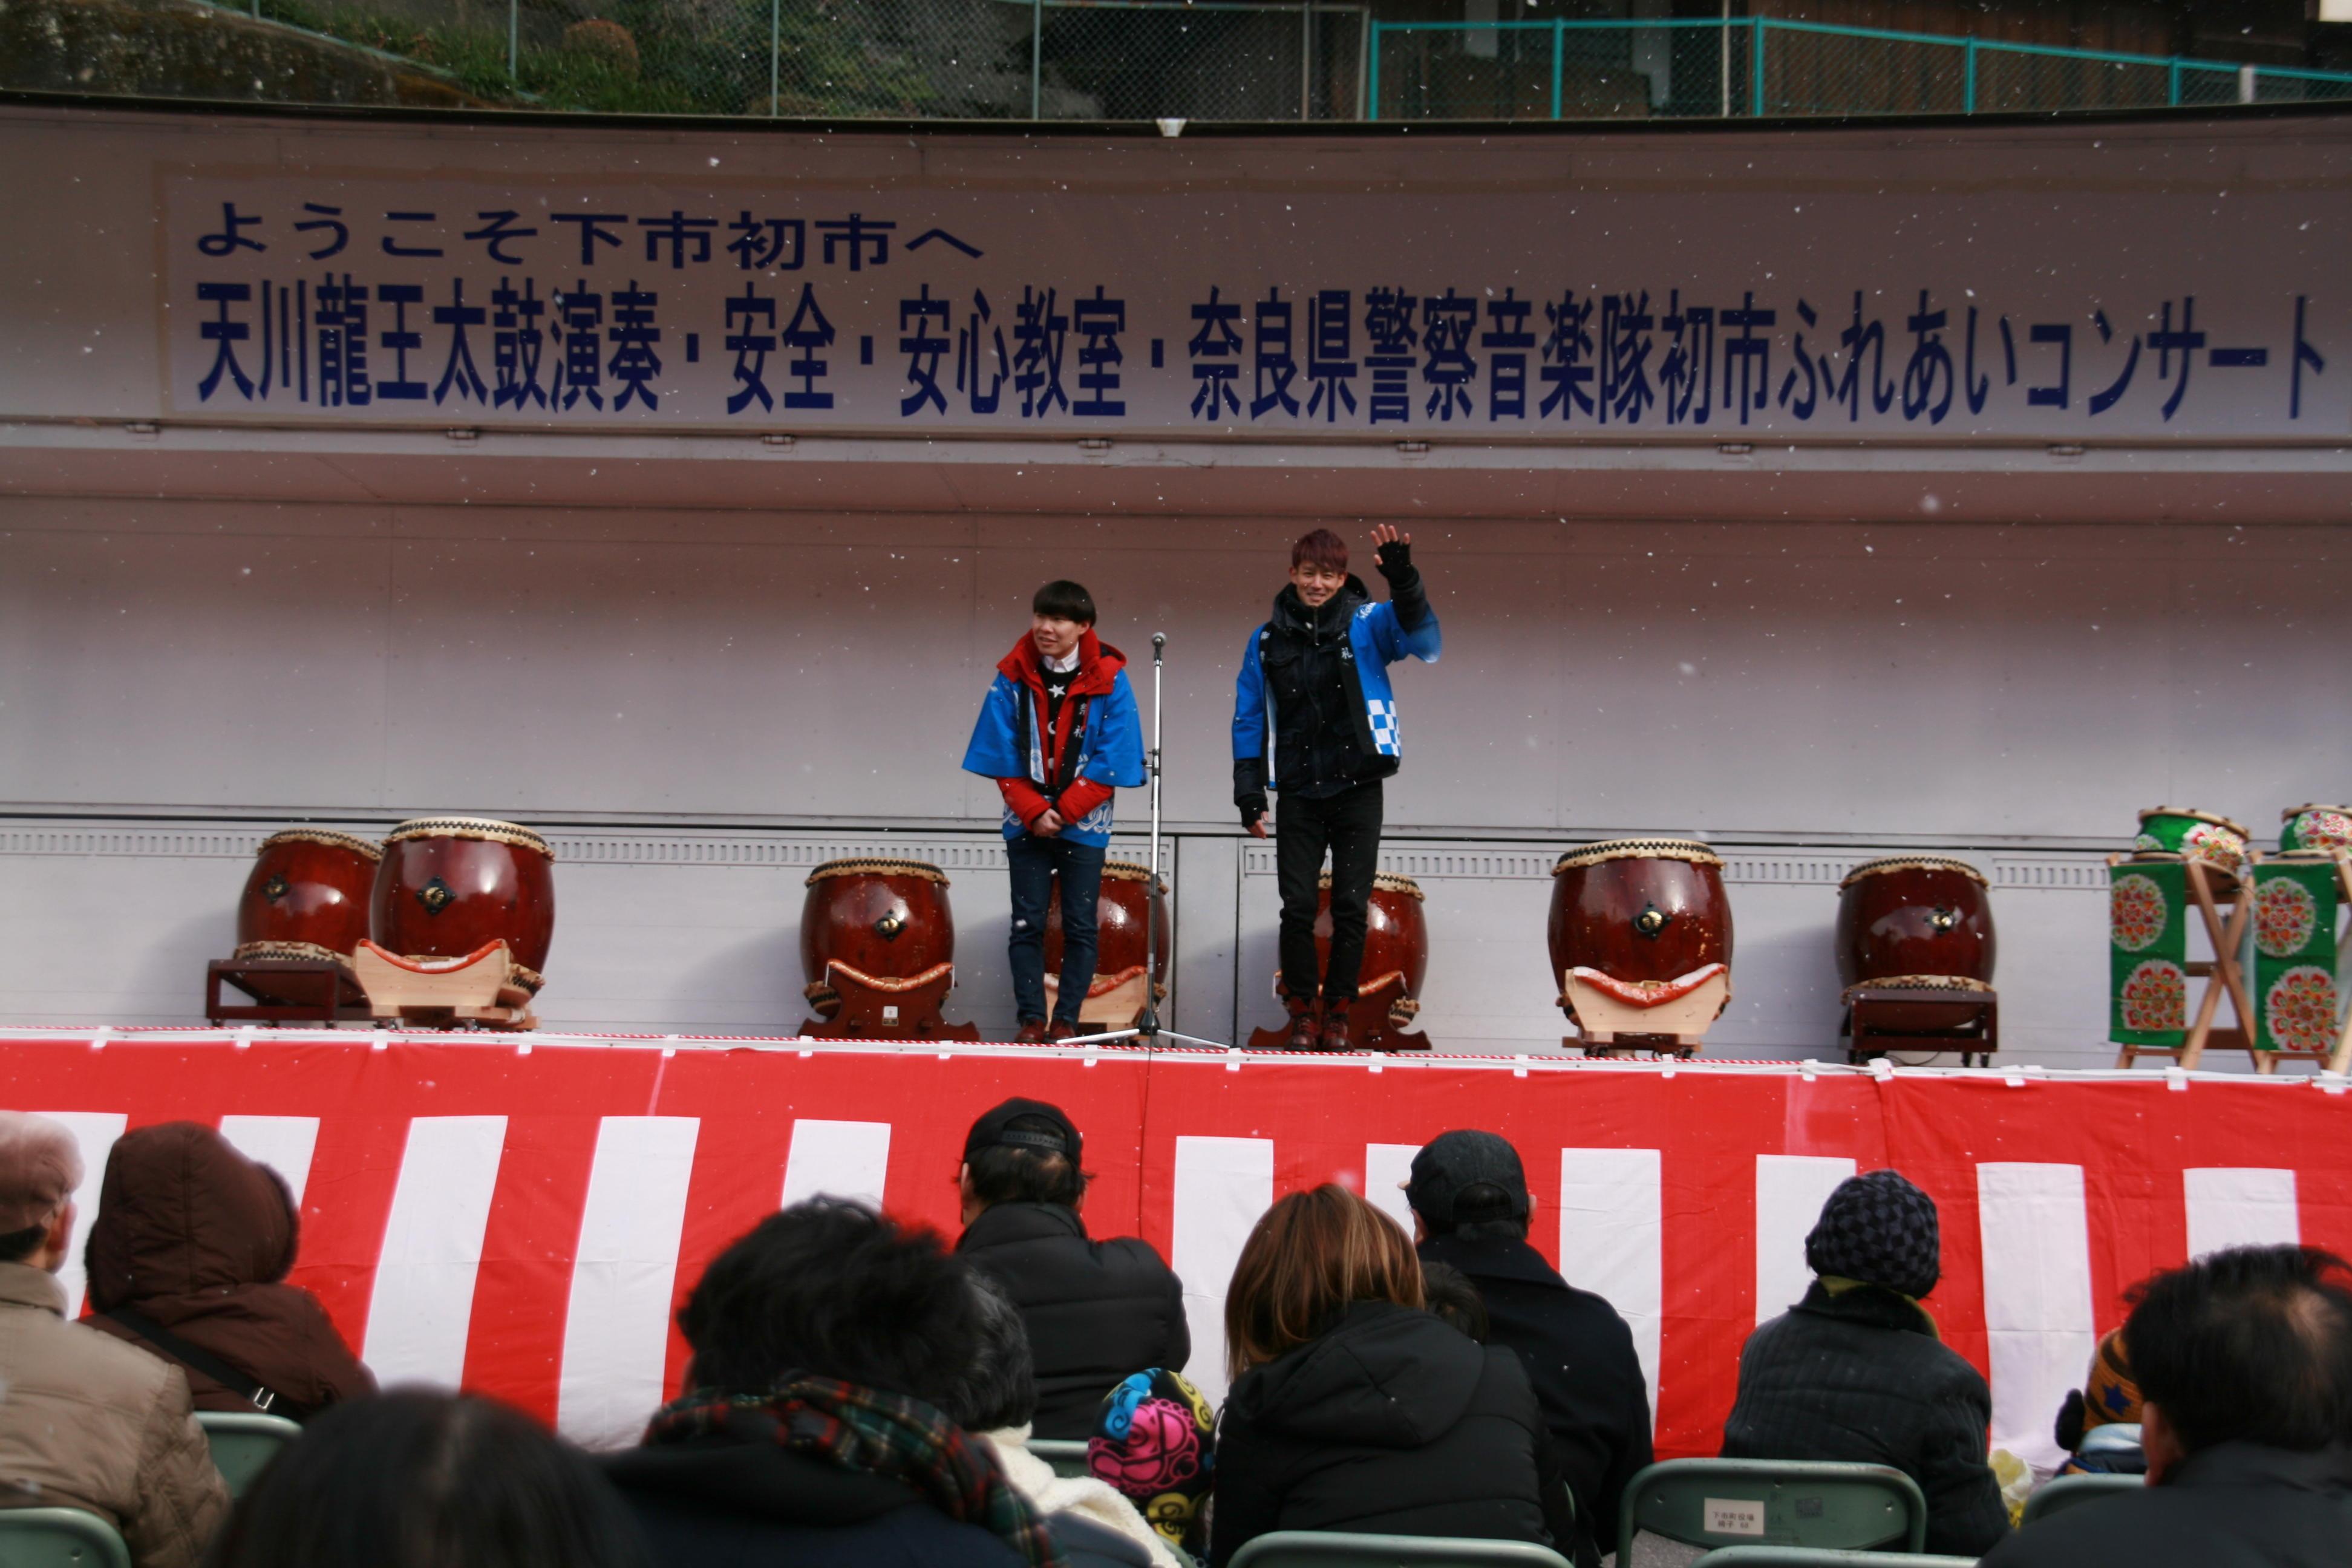 http://news.yoshimoto.co.jp/20180212222836-4b2ce6bde7372863c8cd0a1a5dd76a927abf7d66.jpg